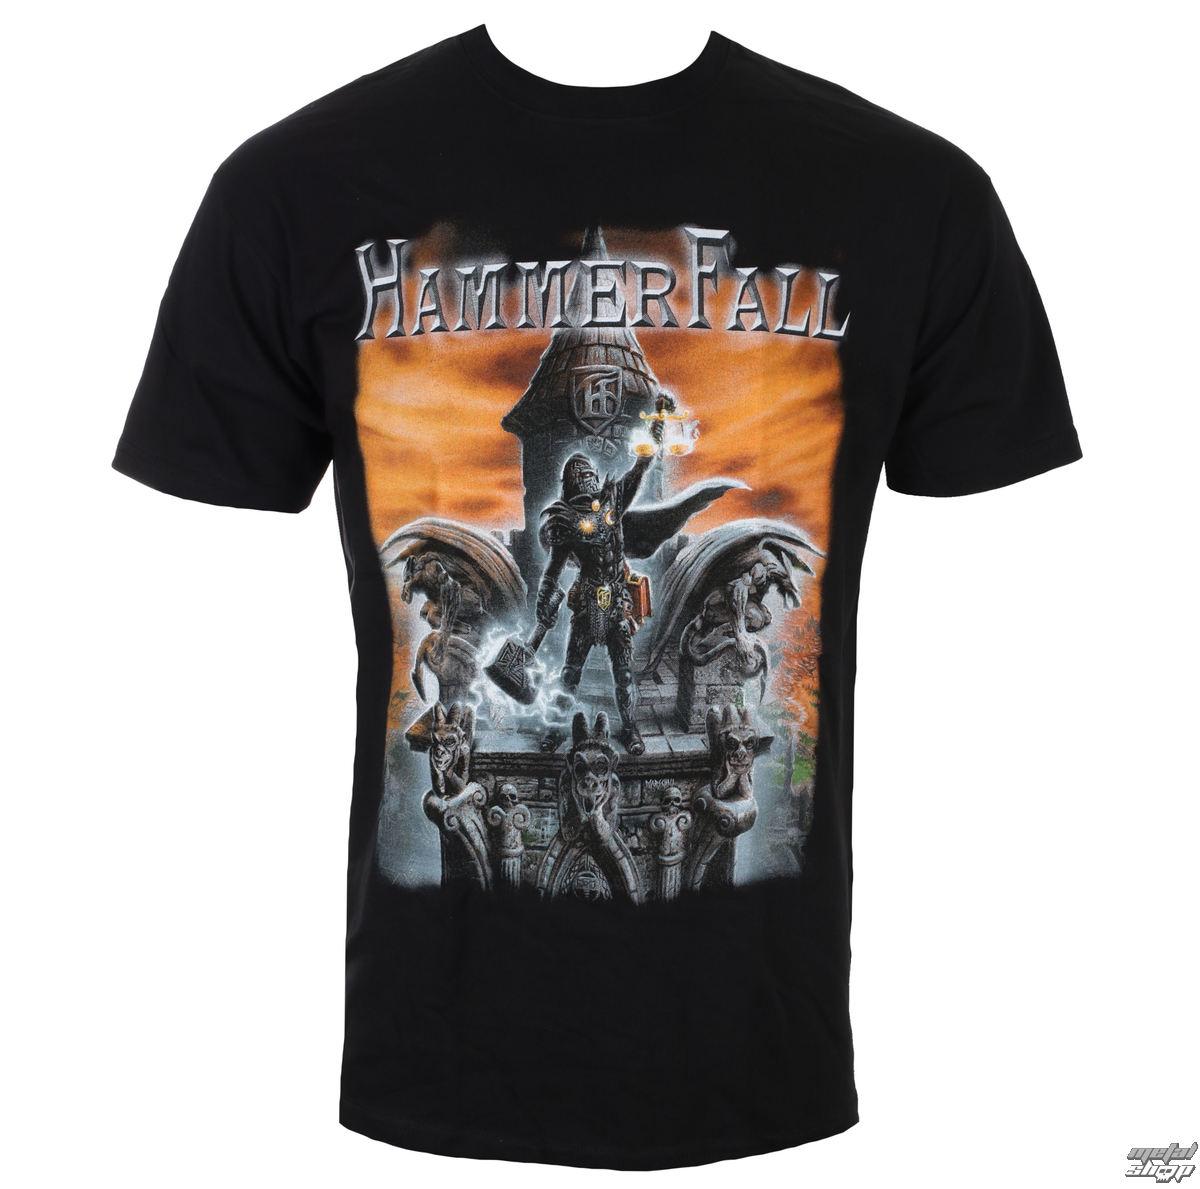 To Built Shirt Napalm Métal Last Pour Tee Hammerfall Records Hommes f6Y7ybgv